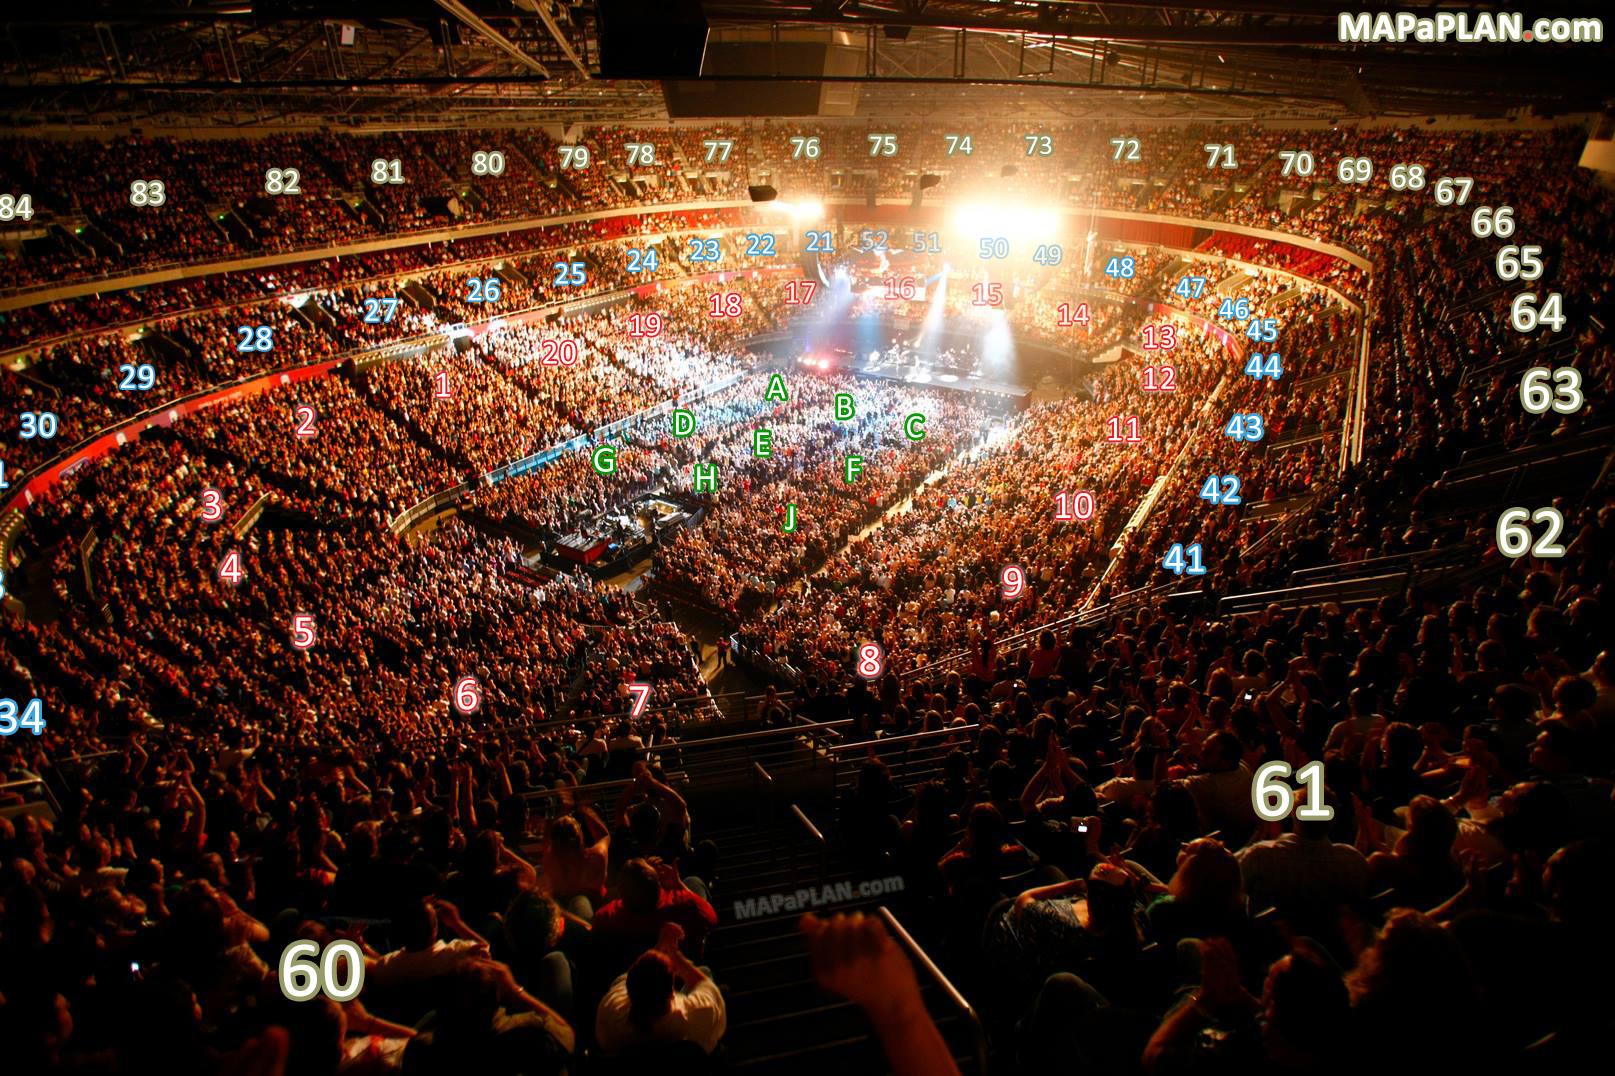 Barclaycard Arena Birmingham Capacity | Cardbk.co